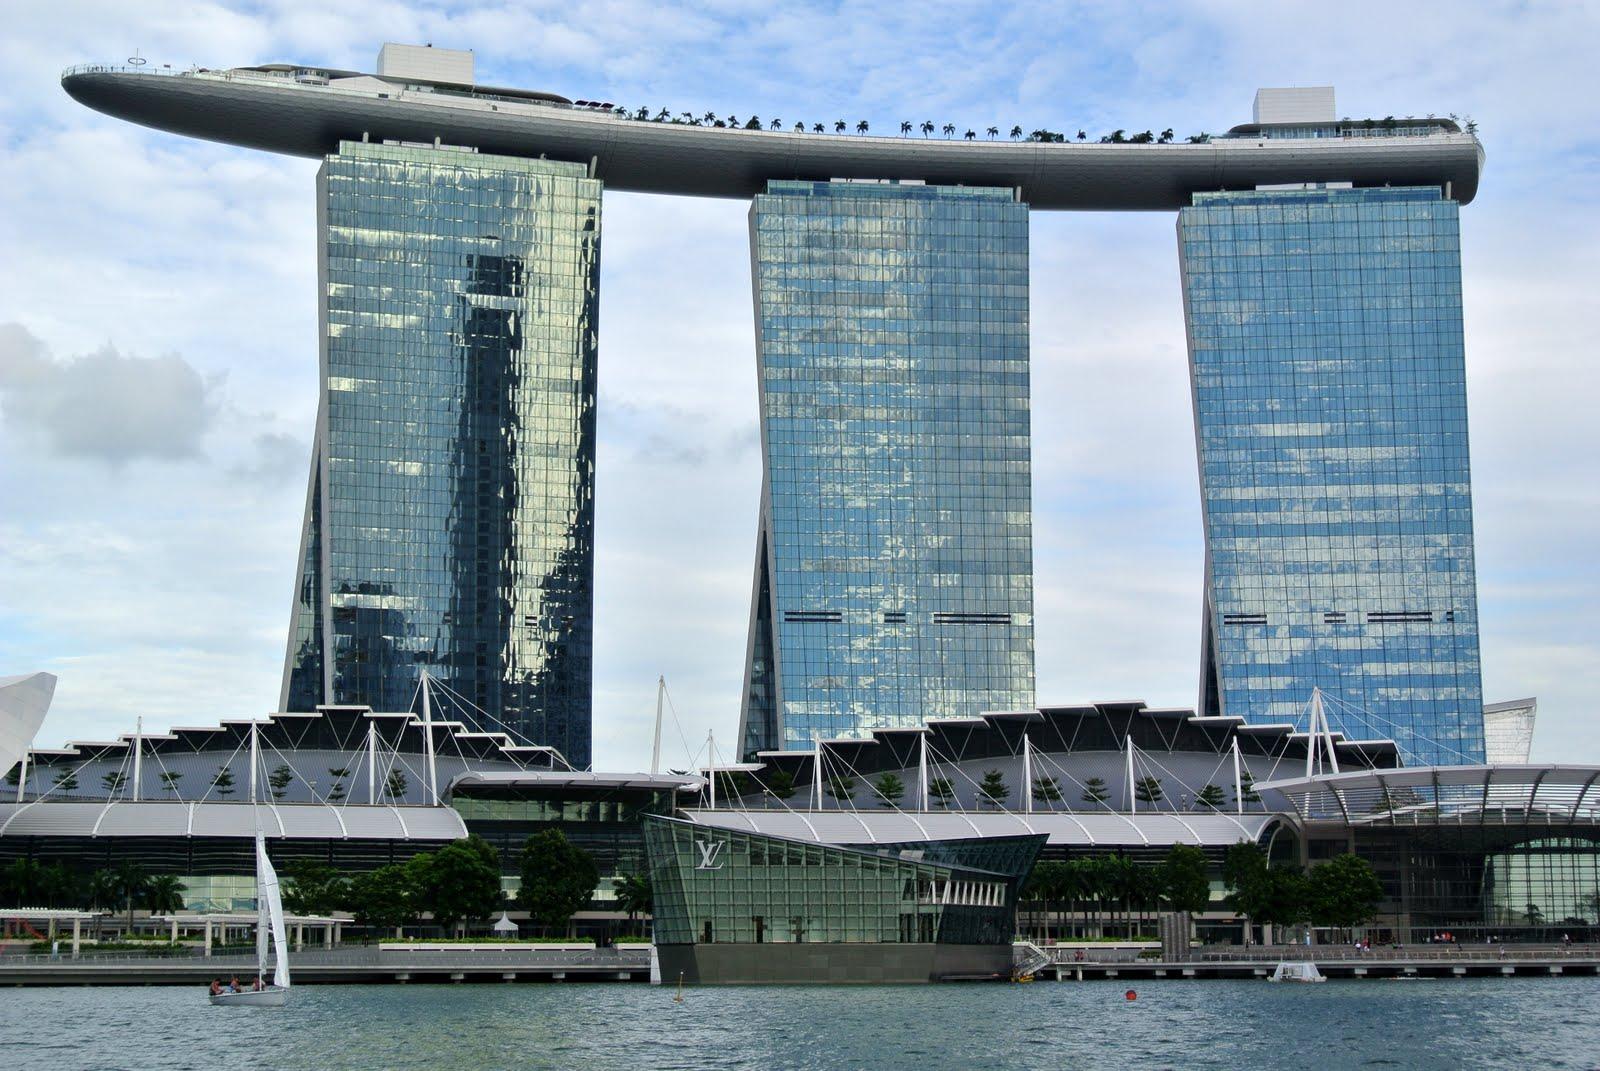 bali 2012 woche 5 singapur. Black Bedroom Furniture Sets. Home Design Ideas